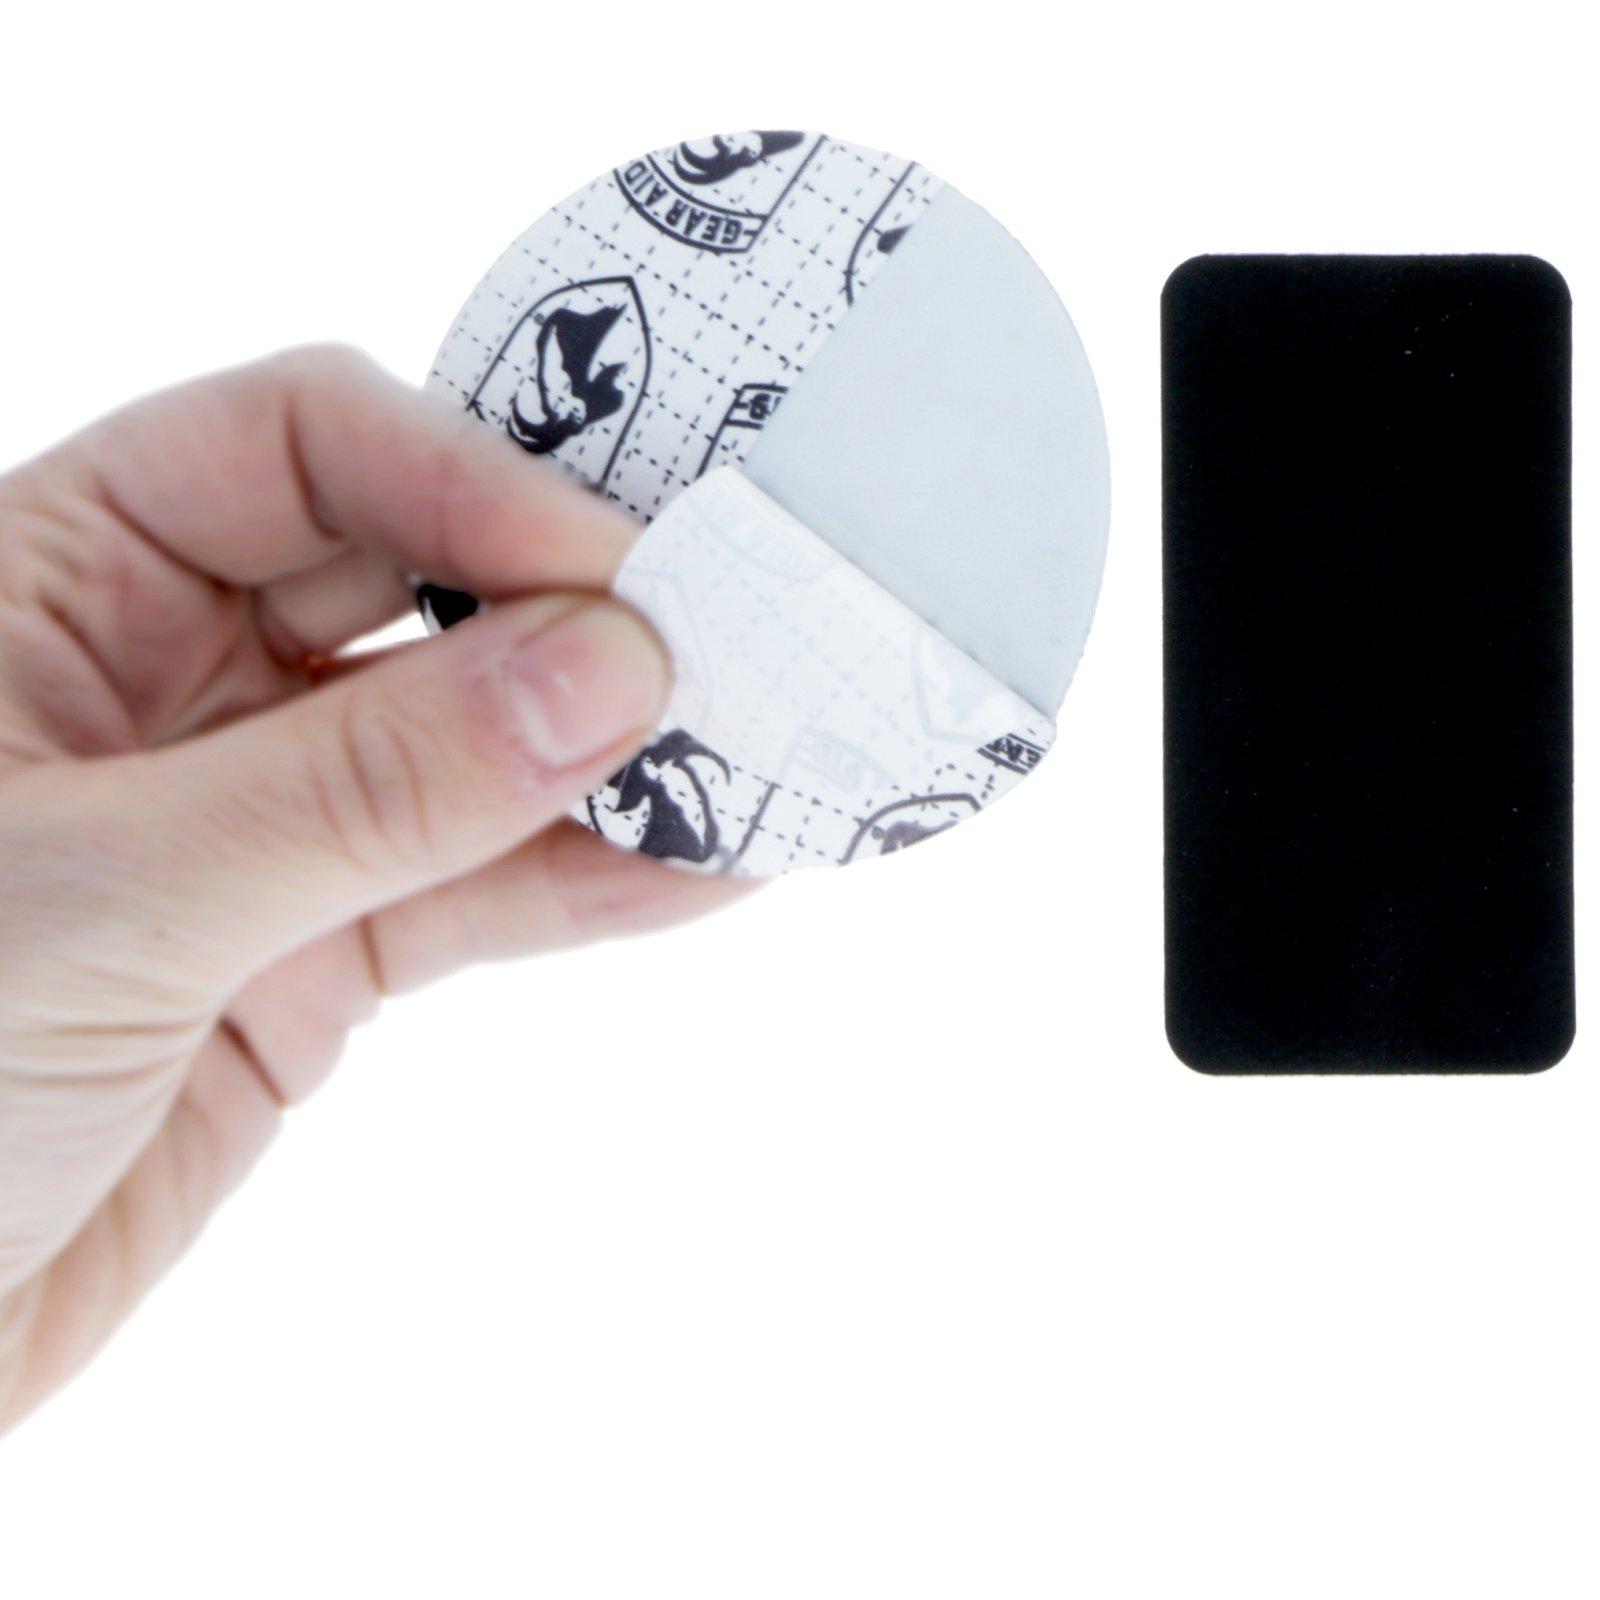 GORETEX Flexible Fabric Patch Repair Kit Medium Weight Camping - 2pc Black Small